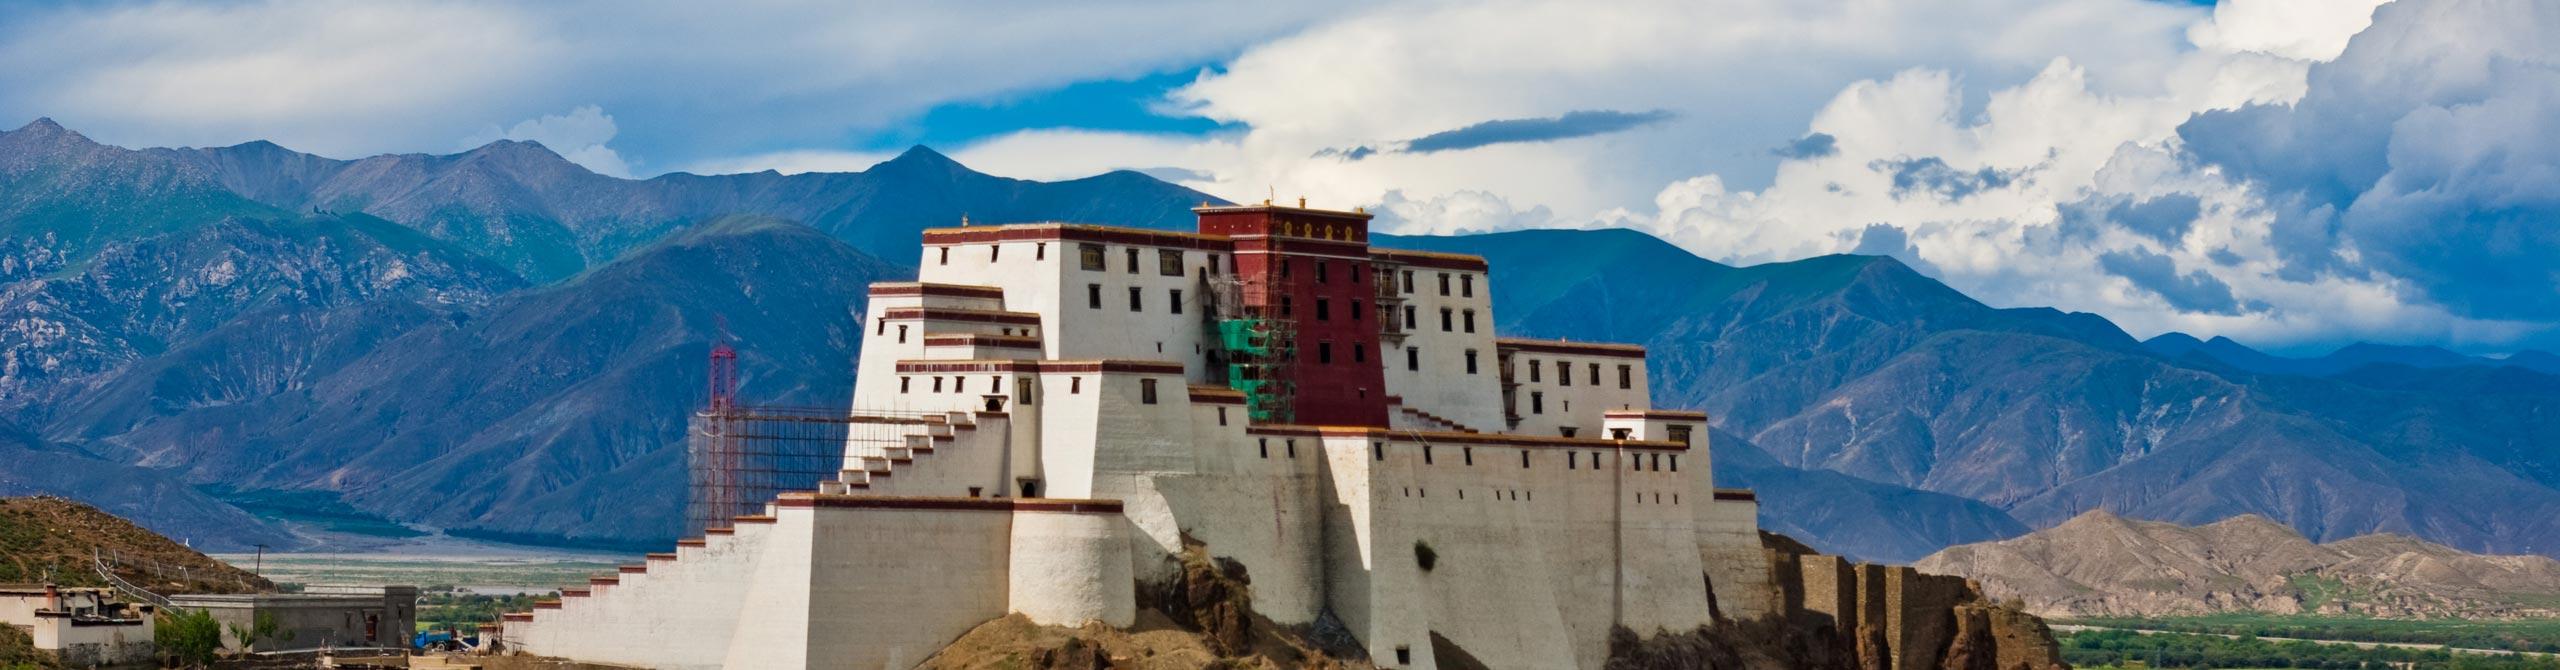 2-Day Lhasa to Shigatse Tour